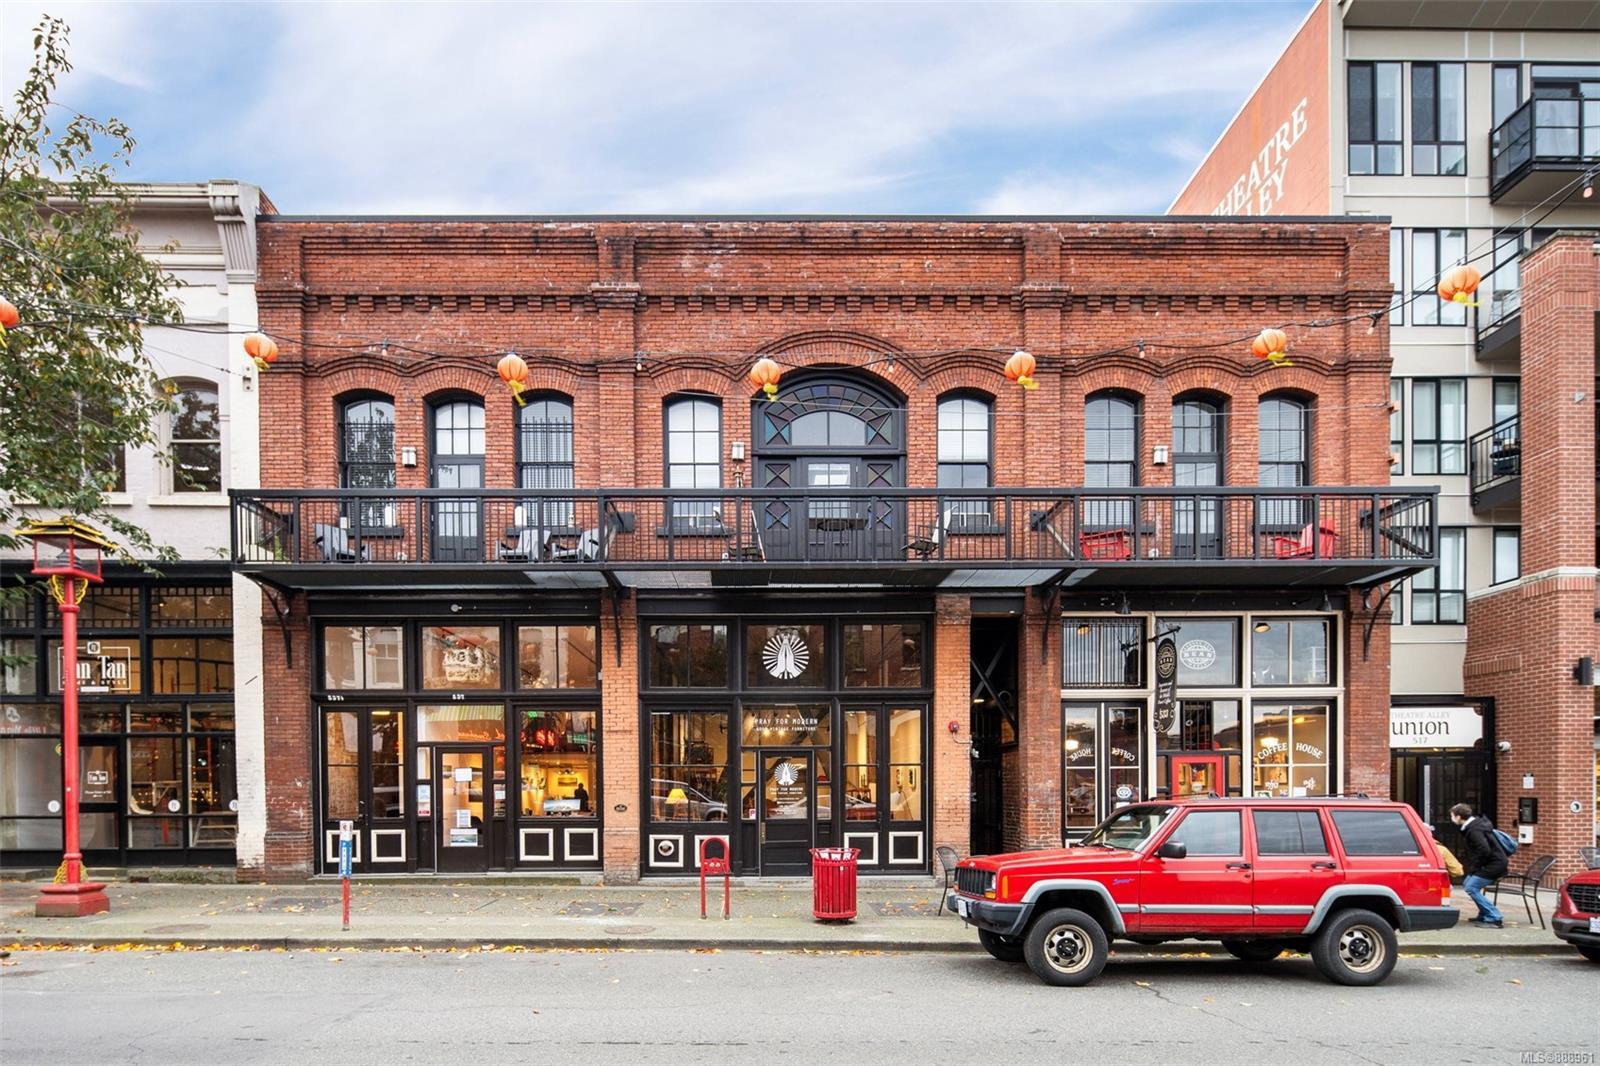 103 - 535 Fisgard Street, Downtown, Victoria photo number 2